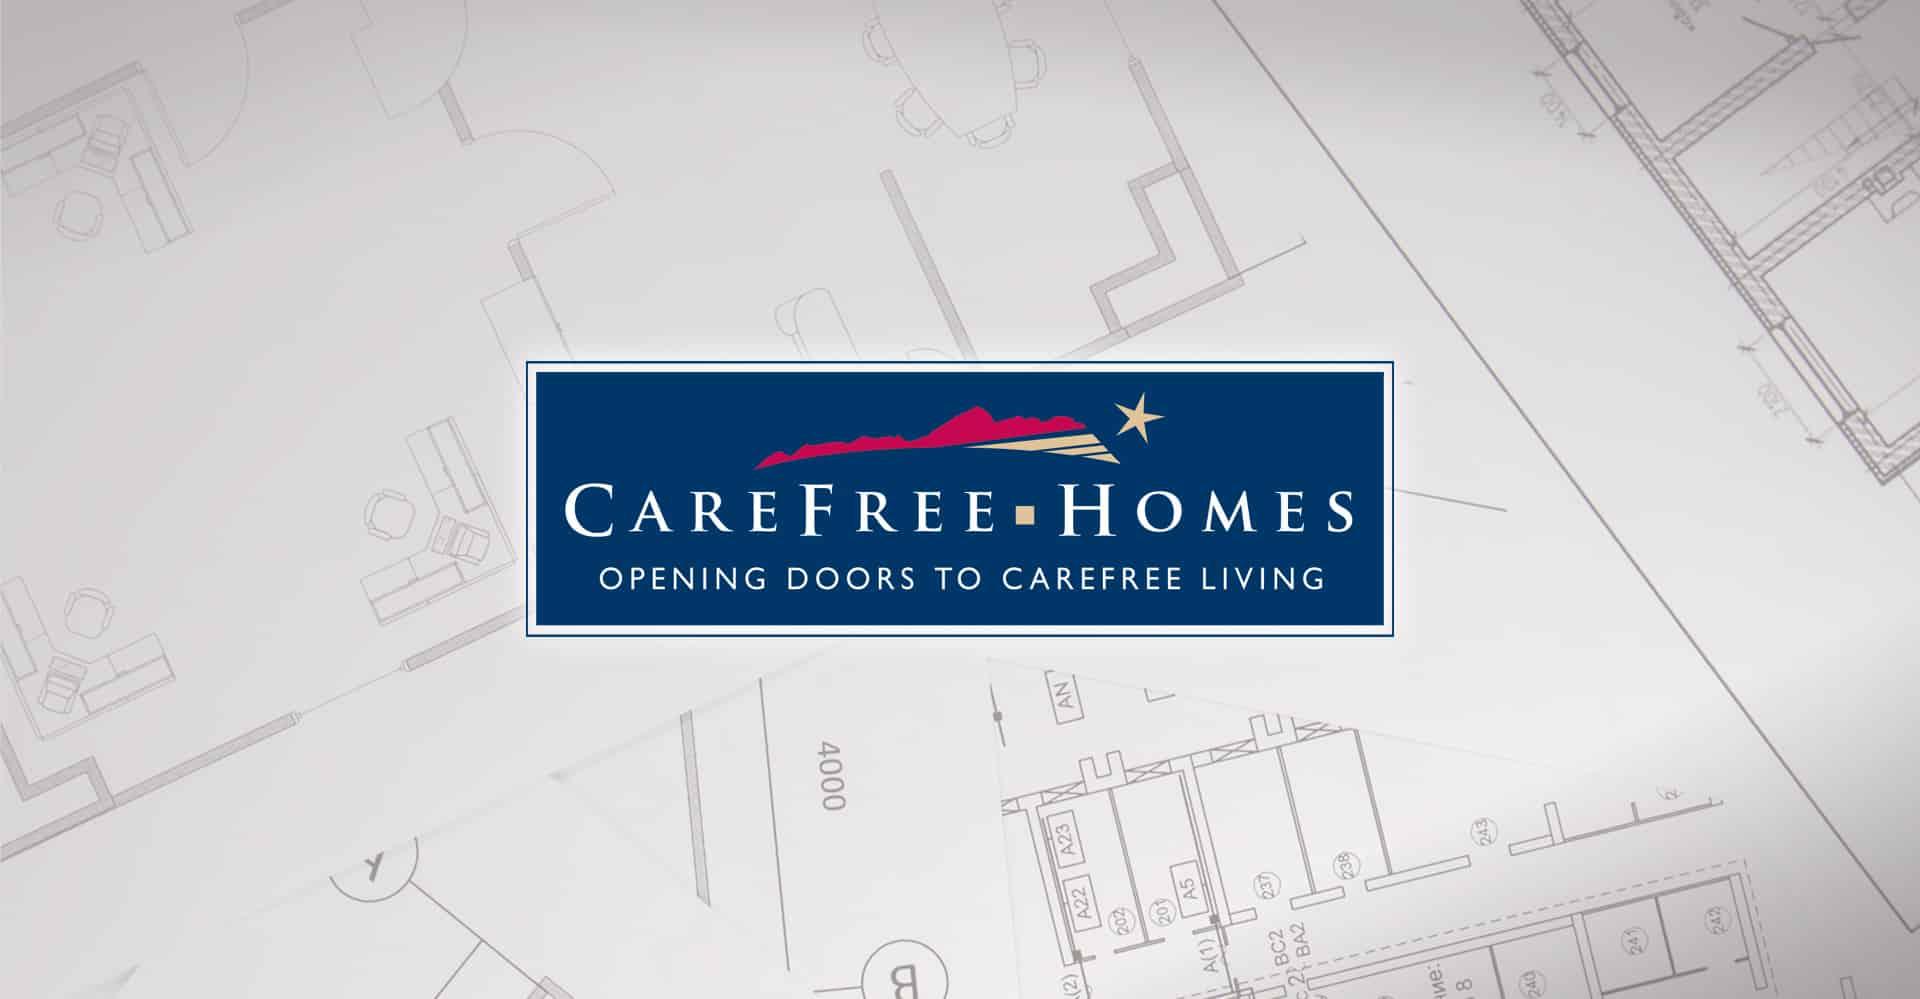 CareFree Homes Model Homes Utah